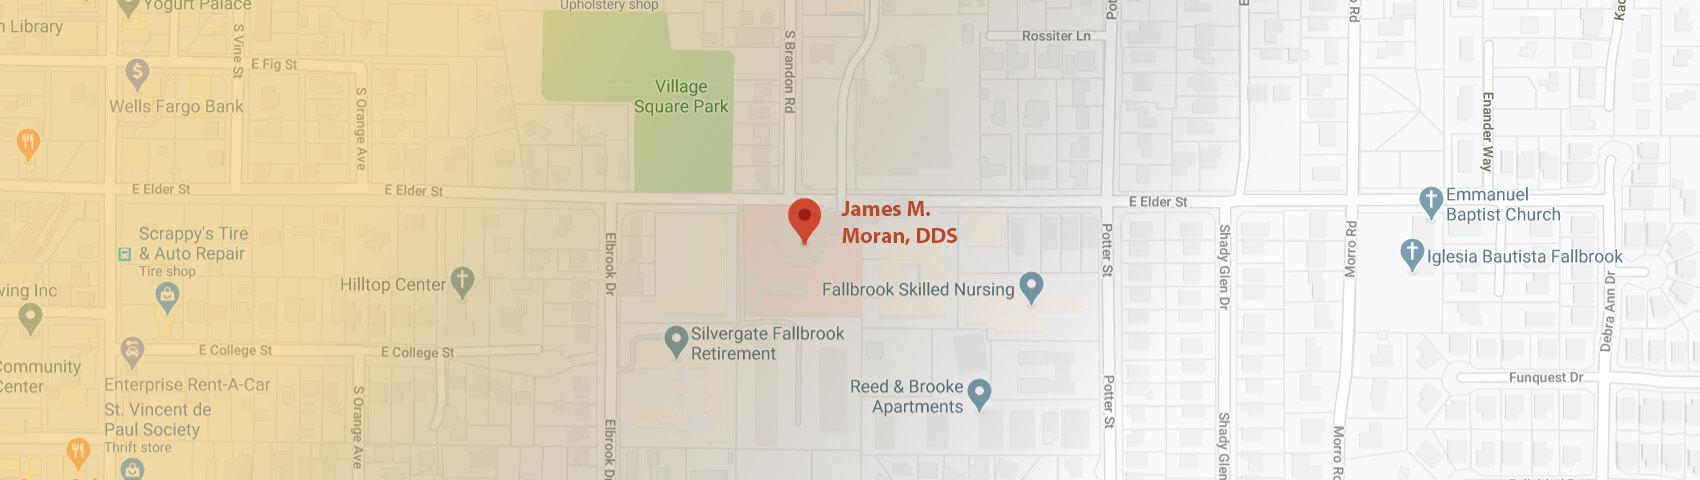 Contact - James M. Moran, DDS General & Cosmetic Dentistry